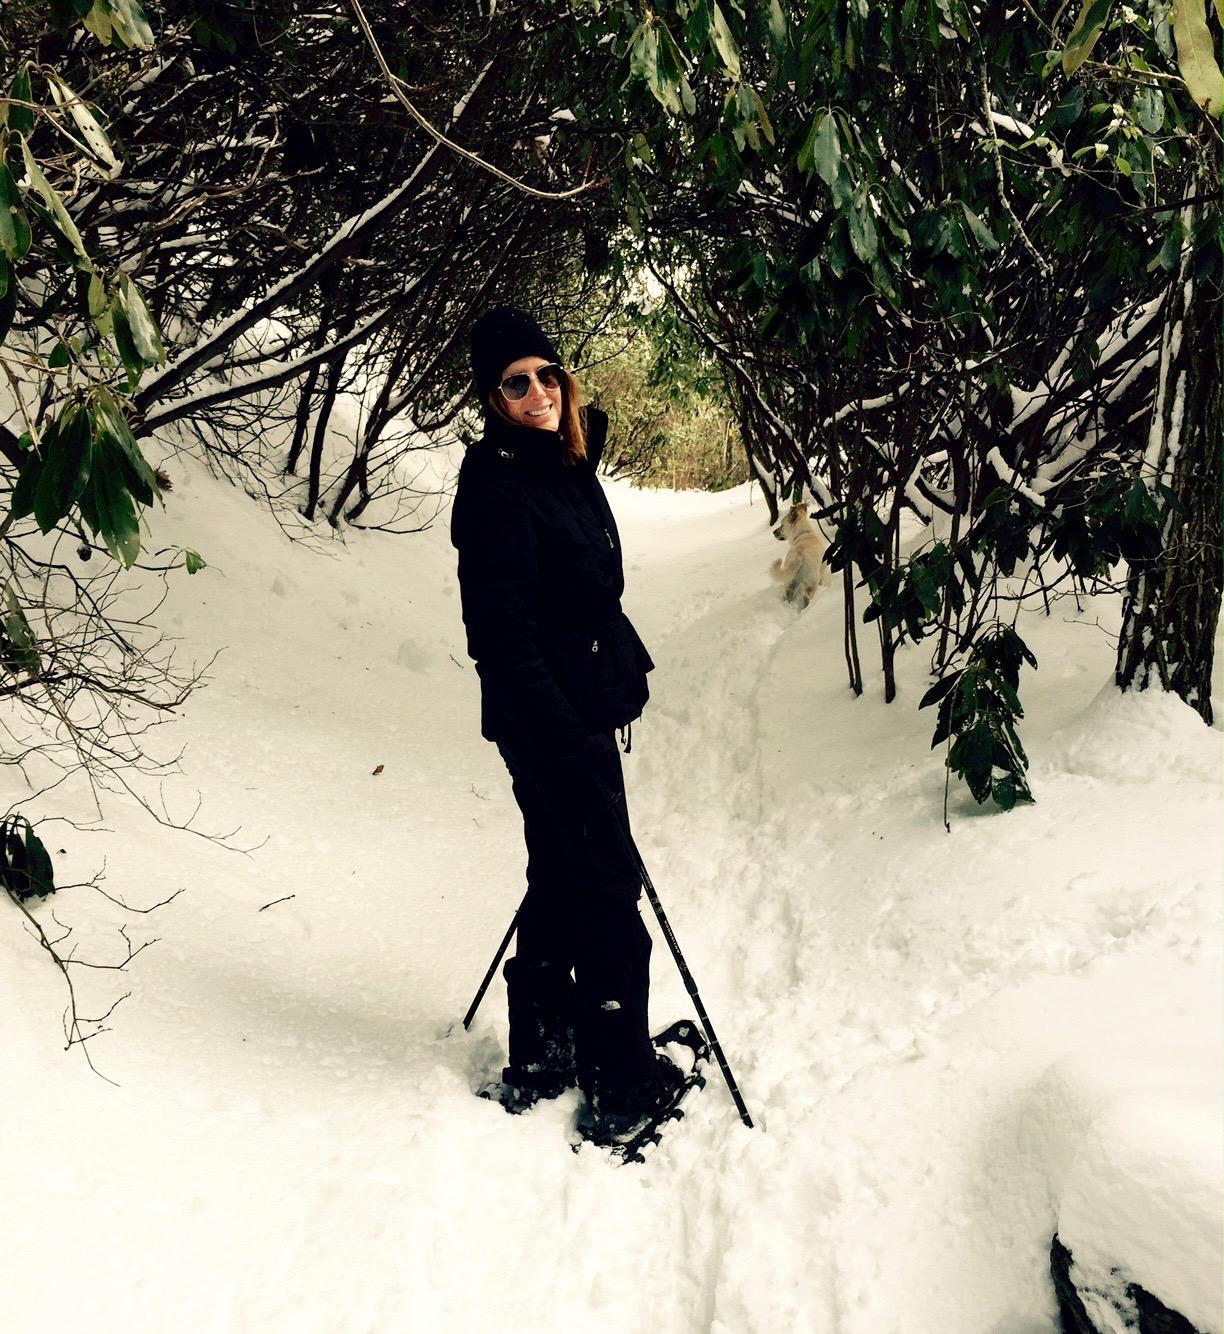 snow-shoeing-bartram-trail-nc.jpg